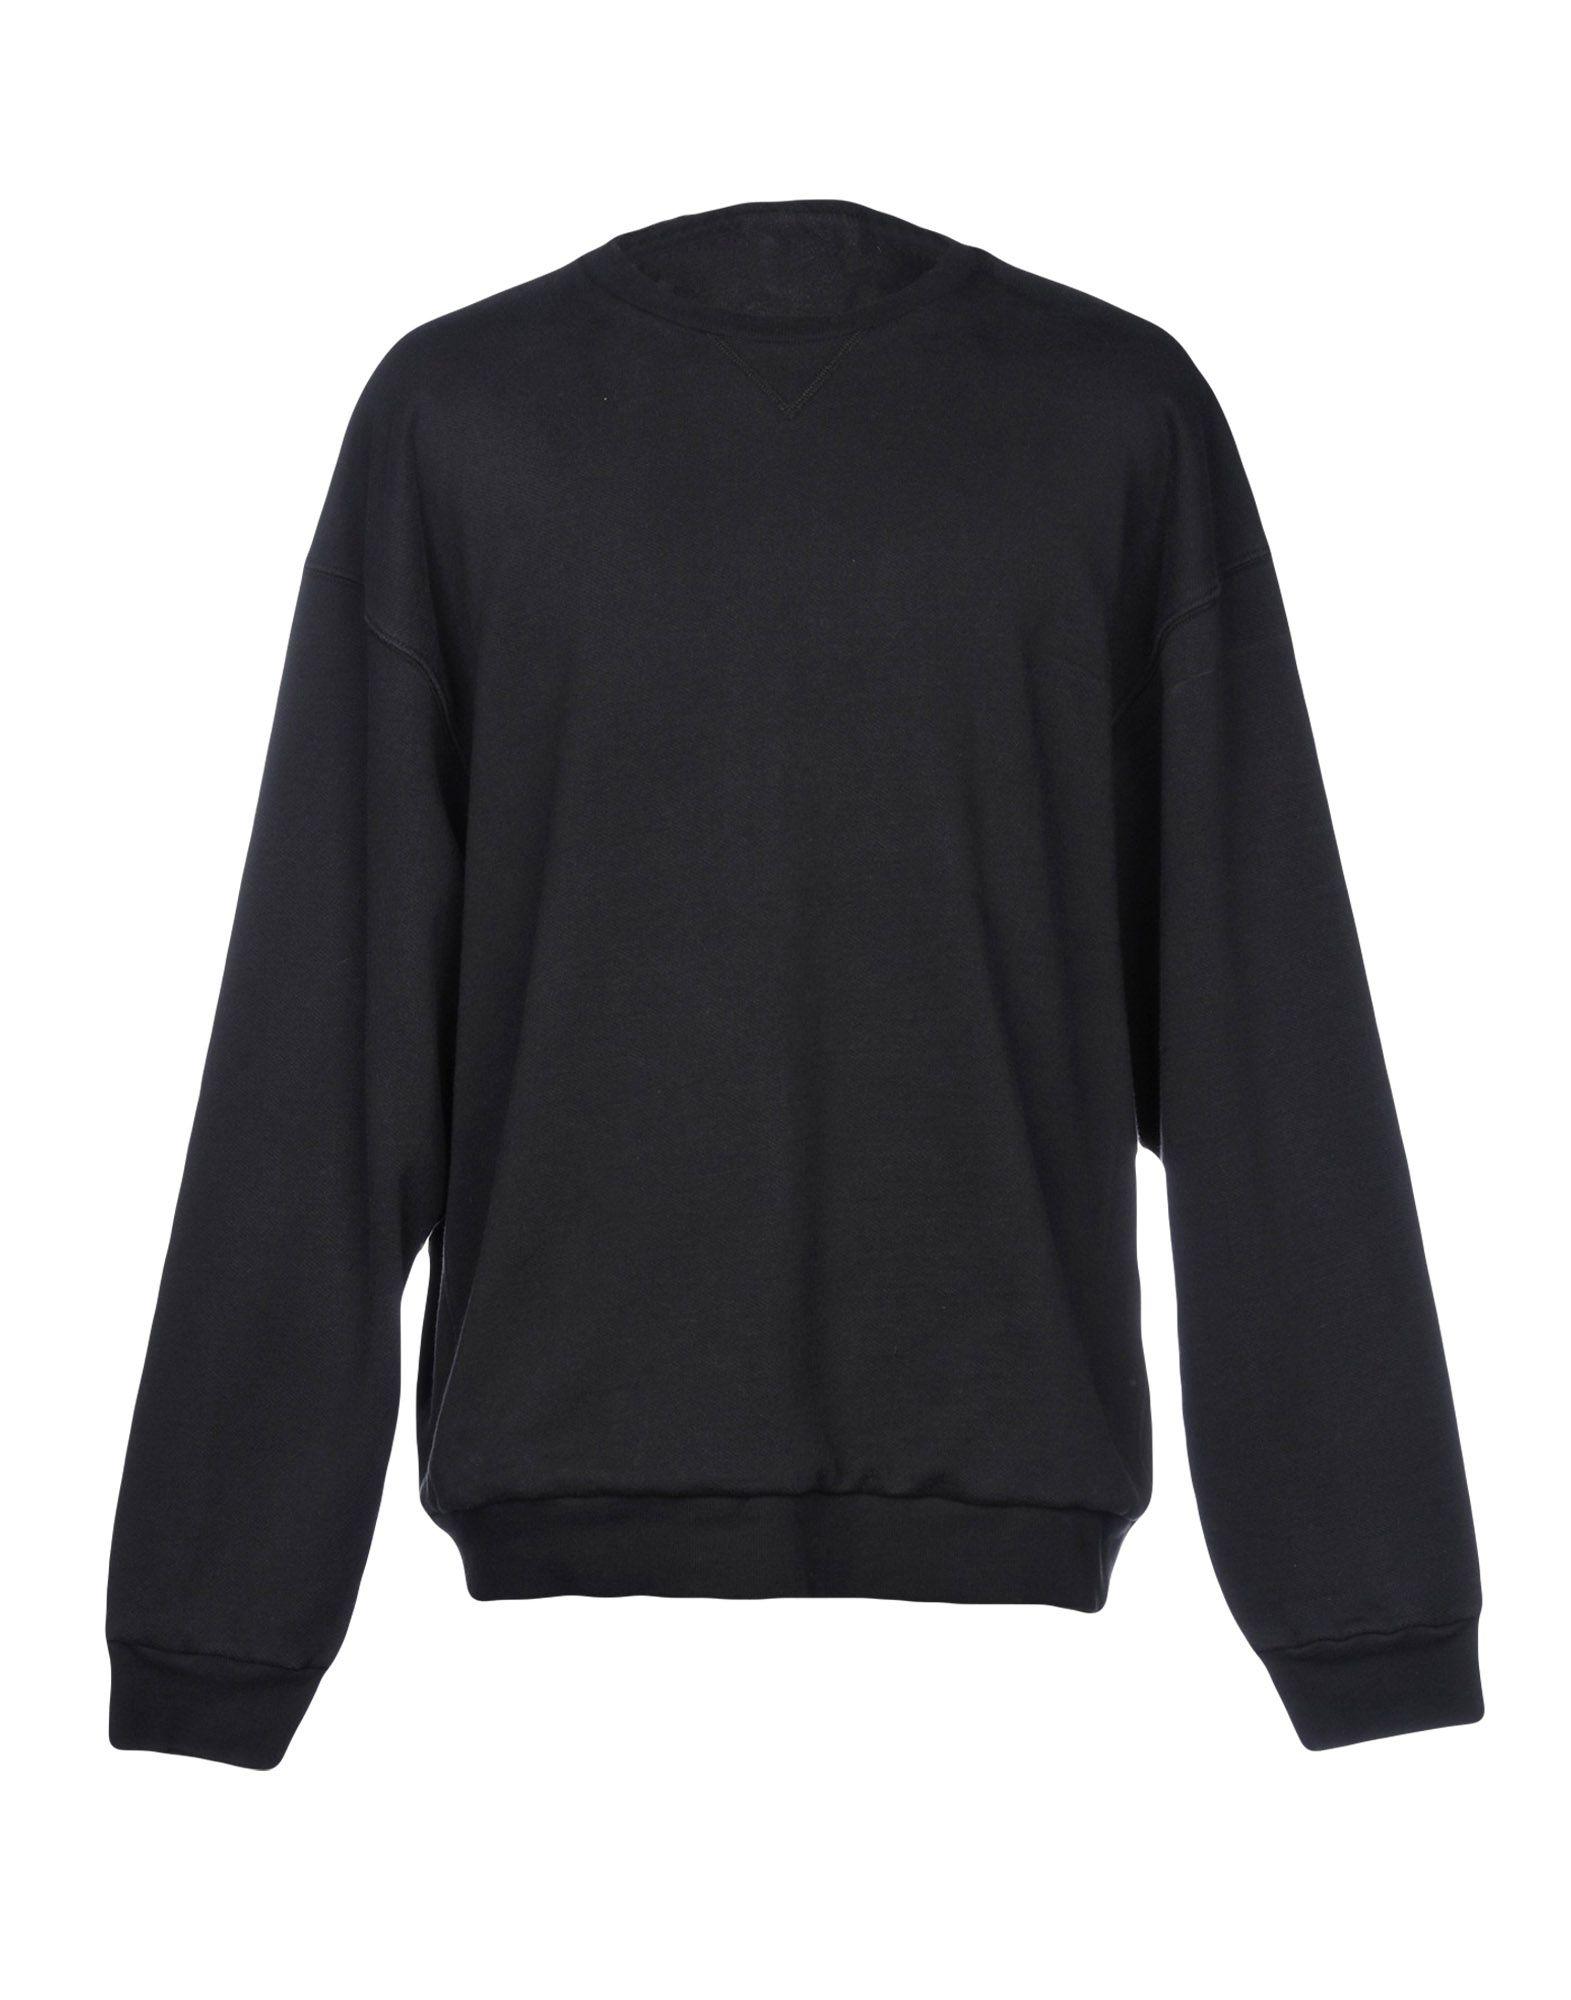 BEN TAVERNITI™ UNRAVEL PROJECT Толстовка ben taverniti™ unravel project свитер